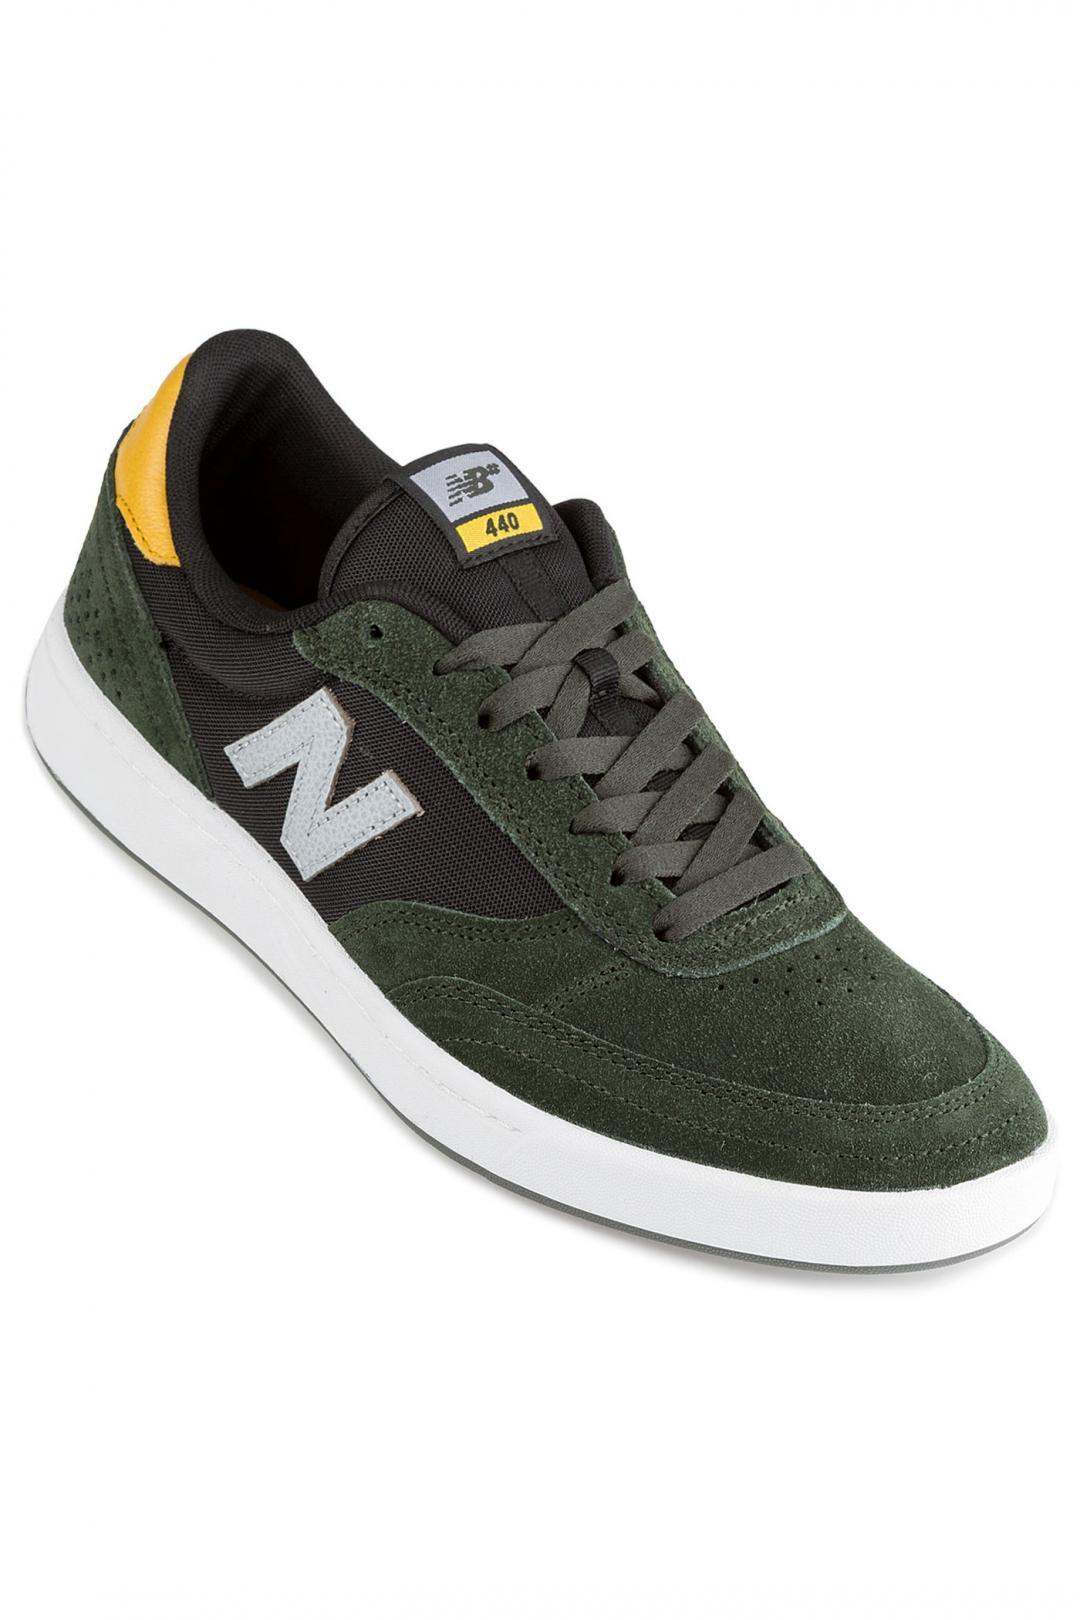 Uomo New Balance Numeric 440 green yellow | Sneaker